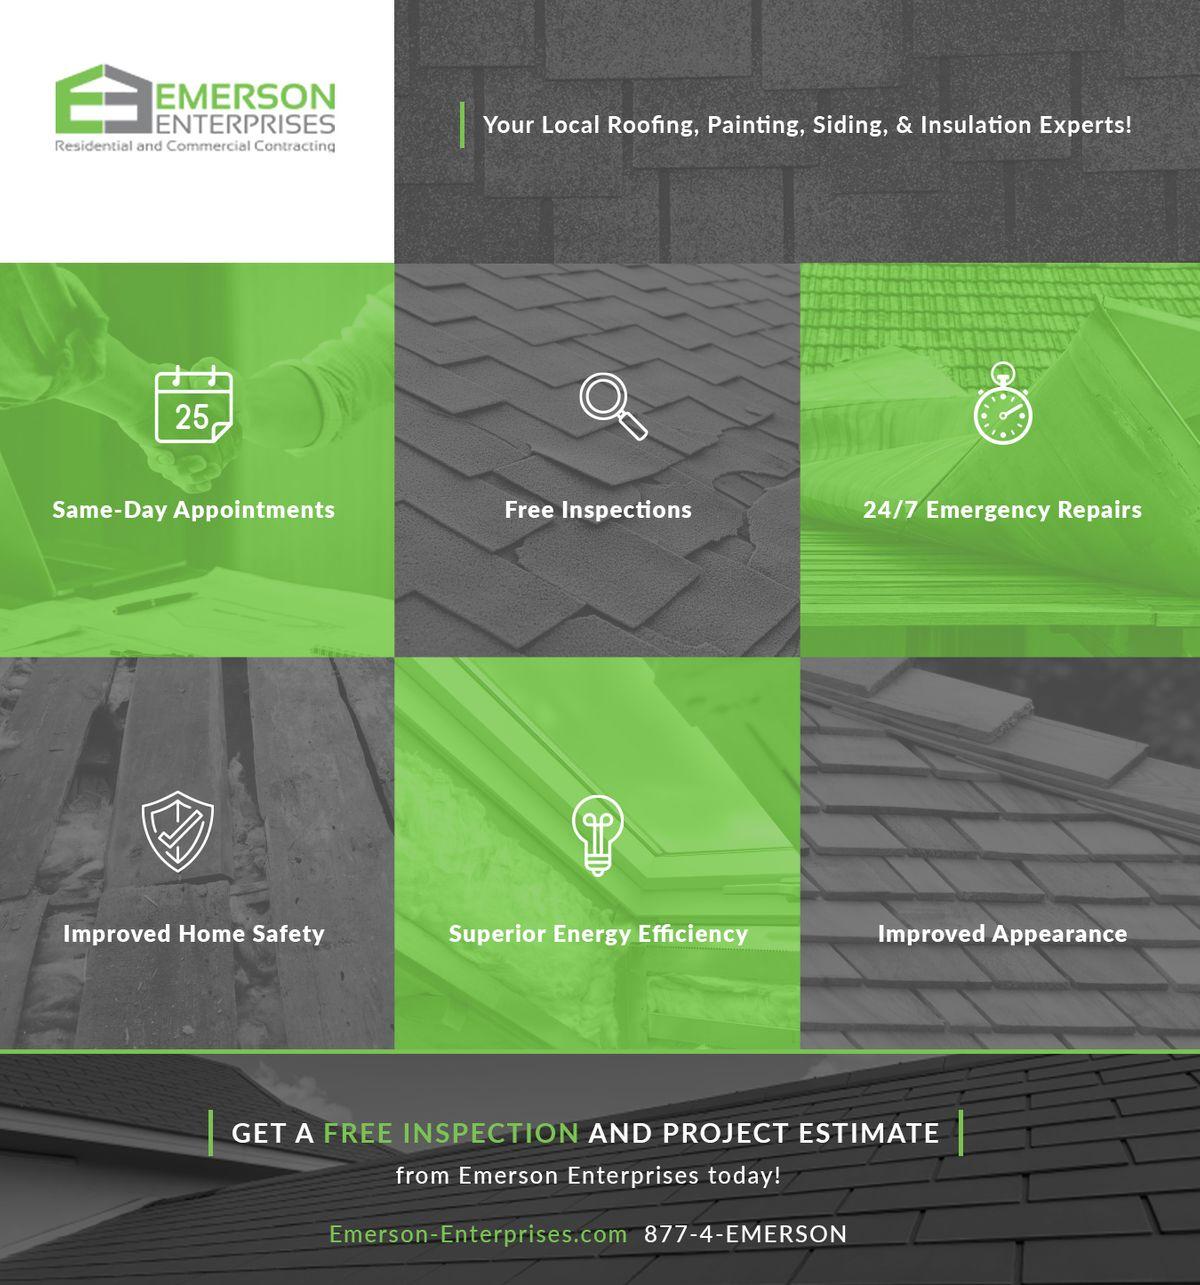 Why-Choose-Emerson-Enterprises-Infographic.jpg